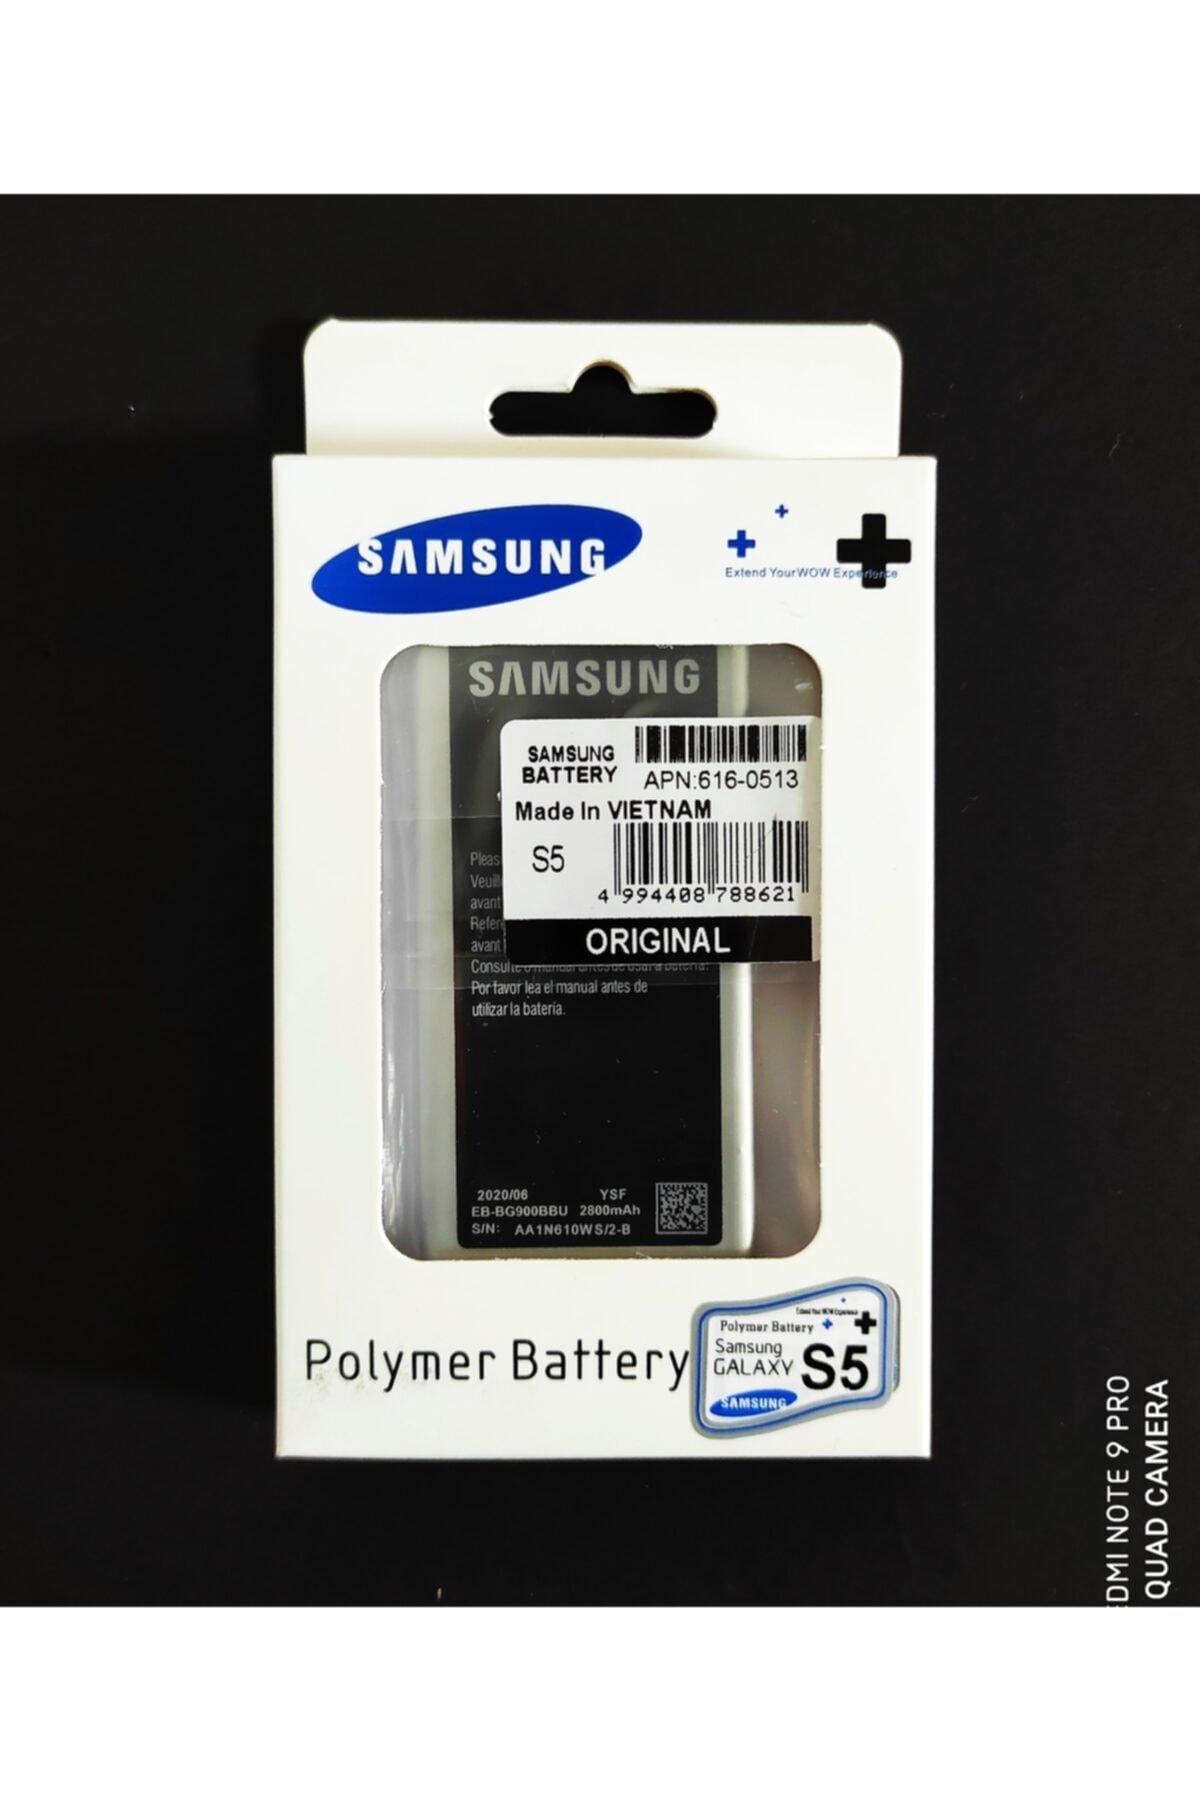 Samson Samsung Galaxy S5 I9600 S5 Orjinal Batarya Pil 2800 Mah Made In Vietnam (jokey Gsm) 1